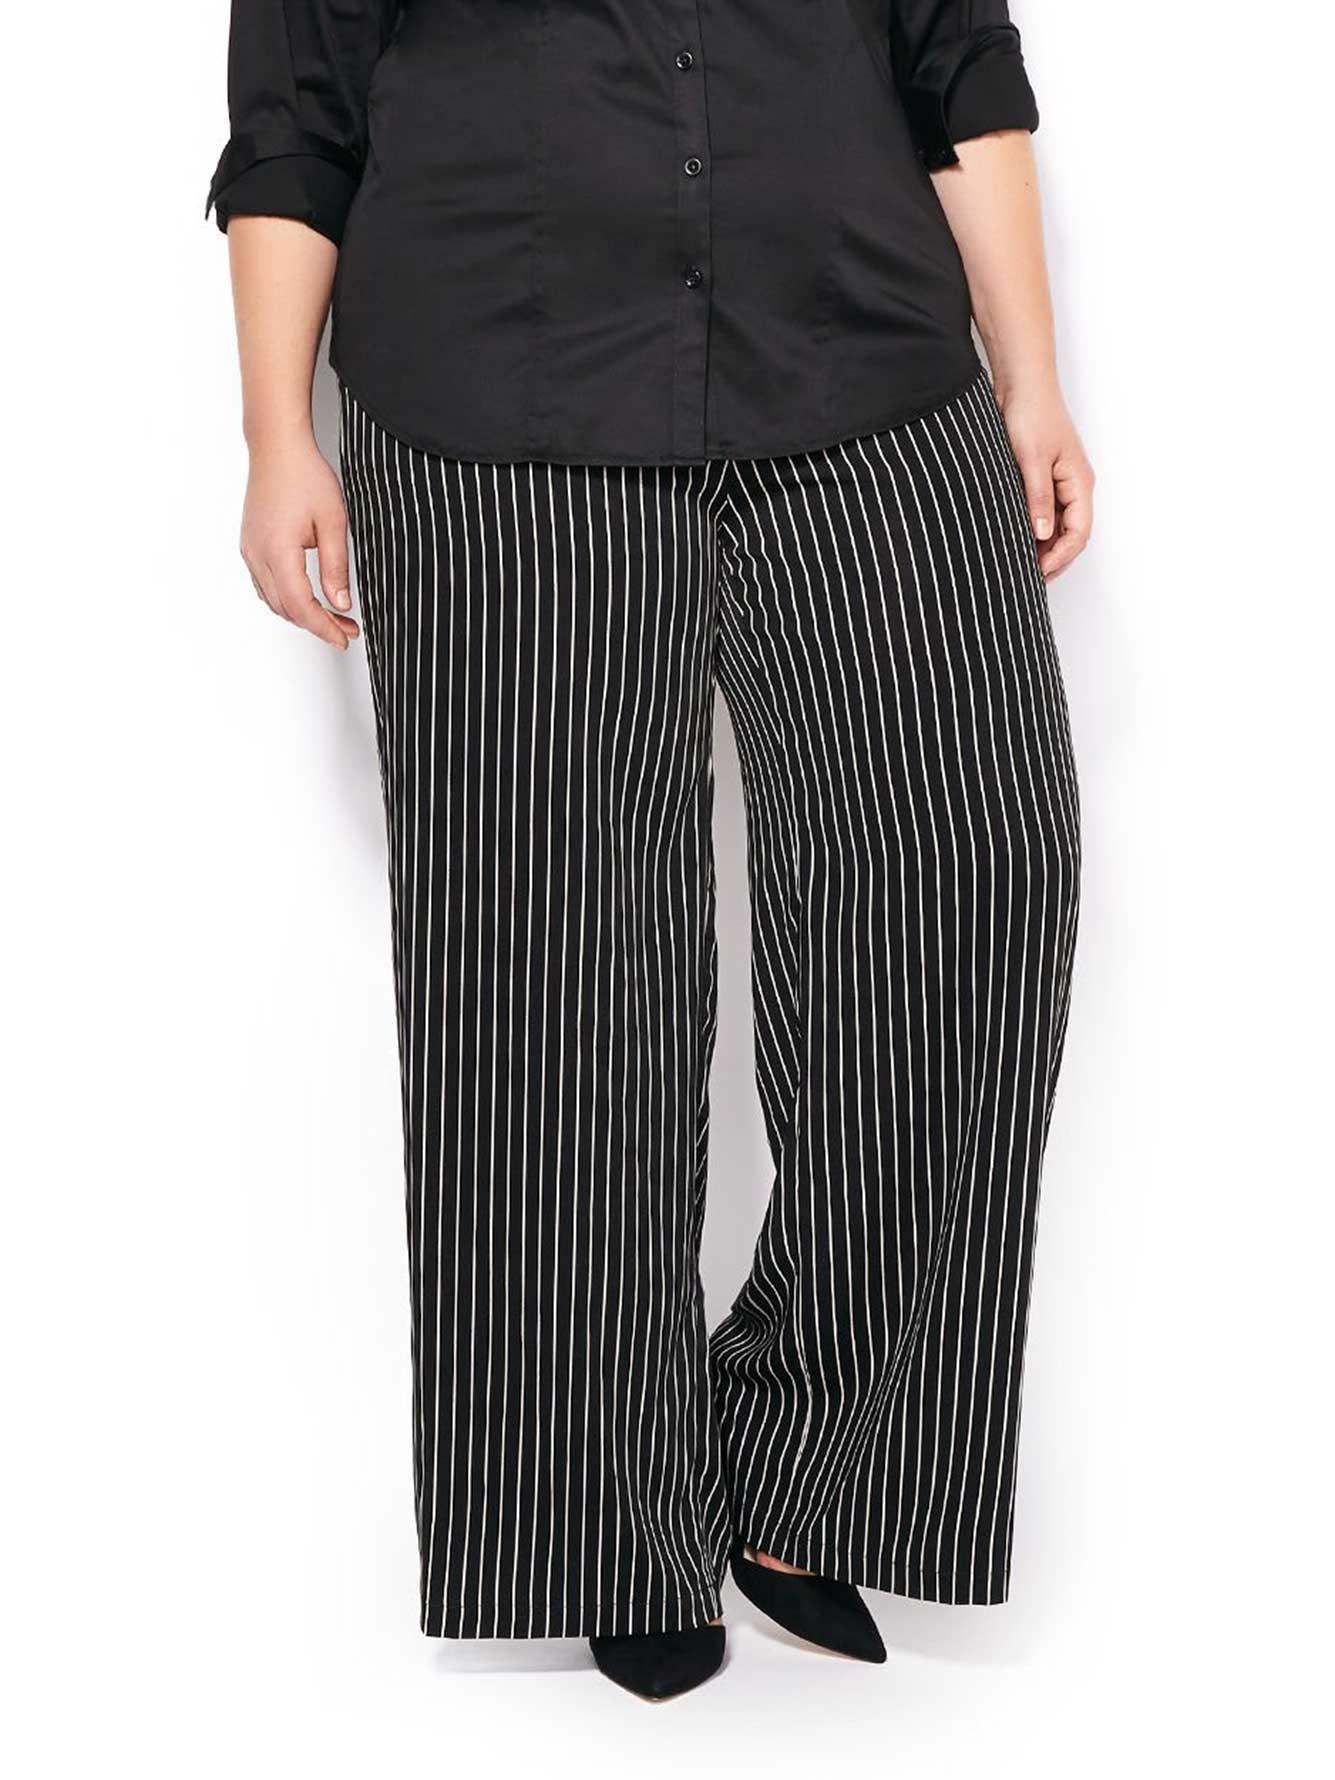 pantalon ray jambe large coupe l g rement galb e penningtons. Black Bedroom Furniture Sets. Home Design Ideas